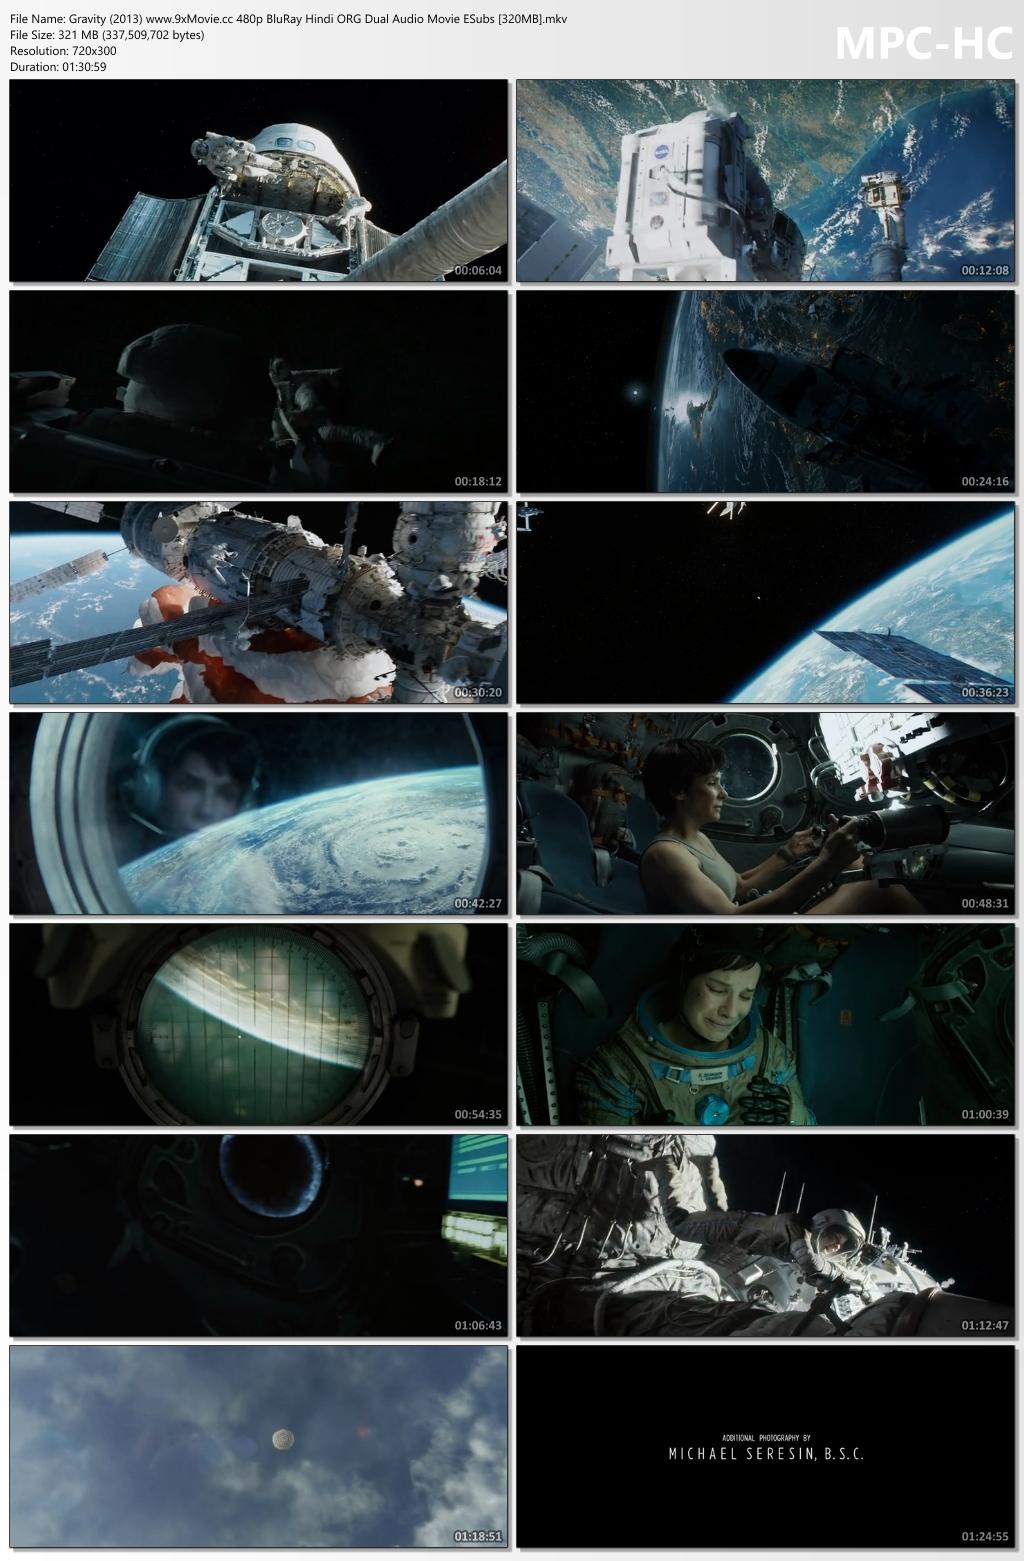 Gravity-2013-www-9x-Movie-cc-480p-Blu-Ray-Hindi-ORG-Dual-Audio-Movie-ESubs-320-MB-mkv